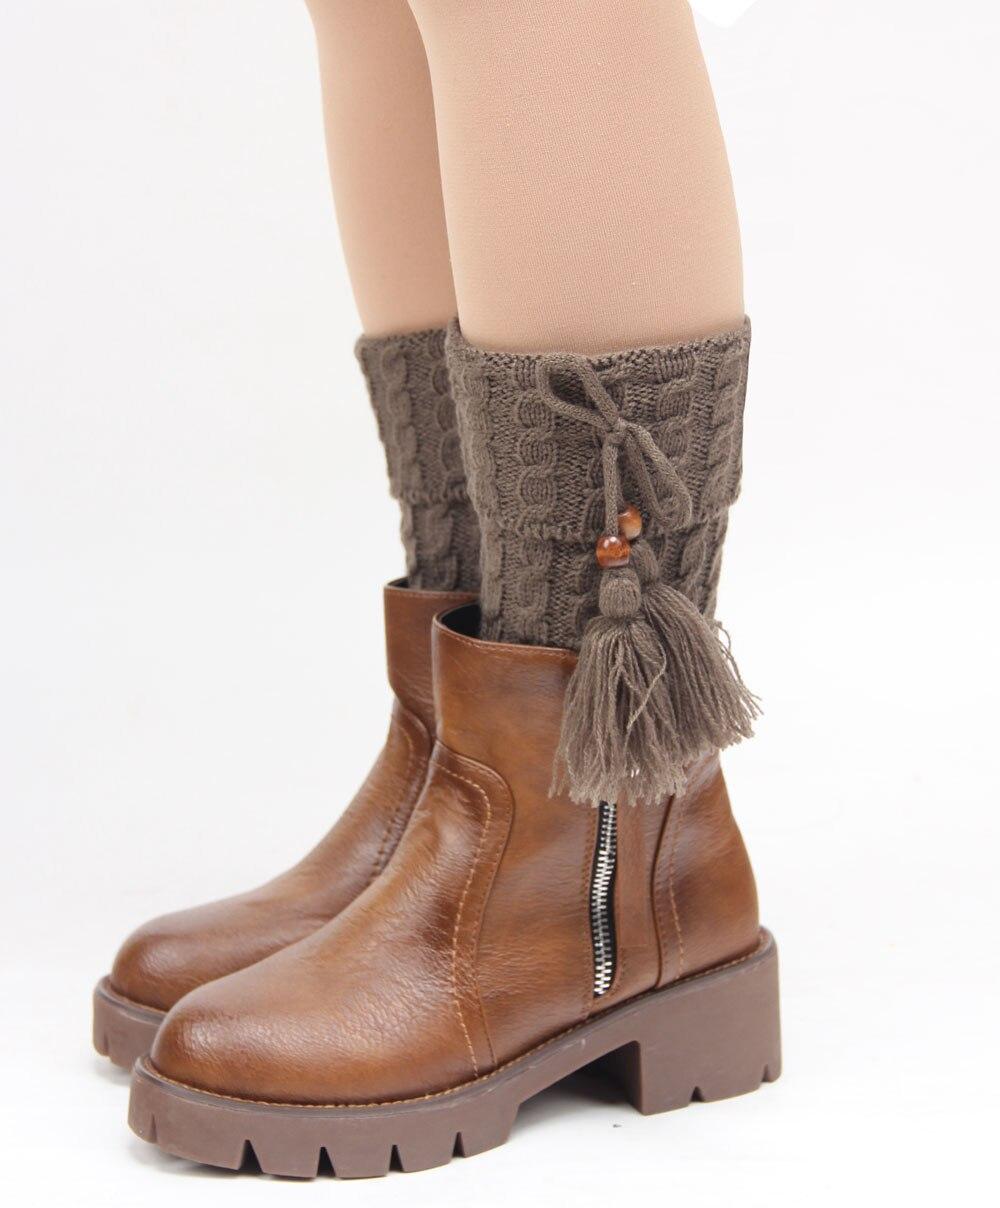 2015 New Design Women Lady Girls Winter Autumn Soft Warm Tassel Bow Knitted Crochet Leg Warmers Socks Boot Cover Boot Knee Socks